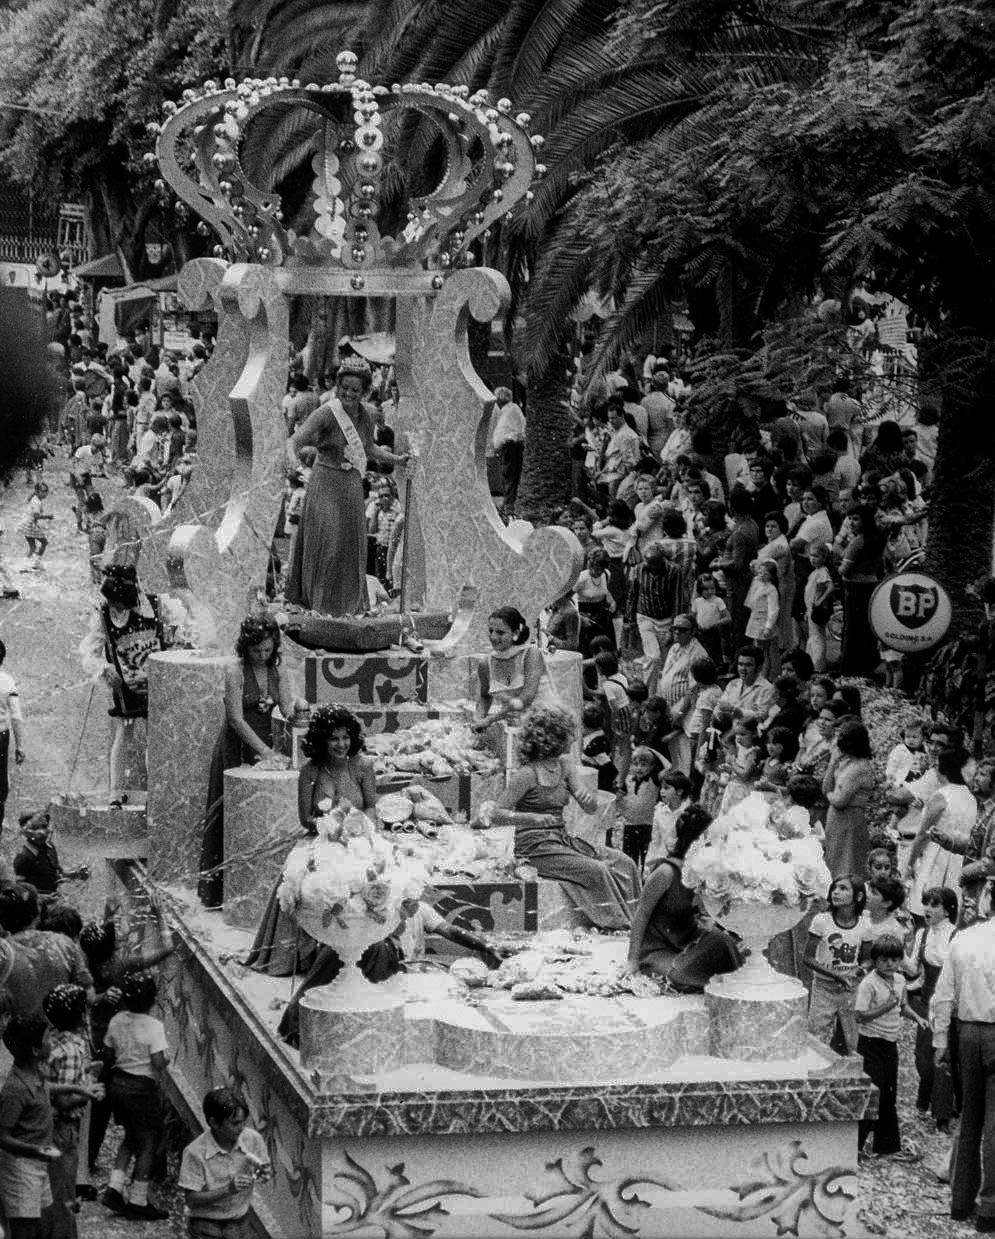 Fiestas de Julio 1974 - Reina Carmen León Devora